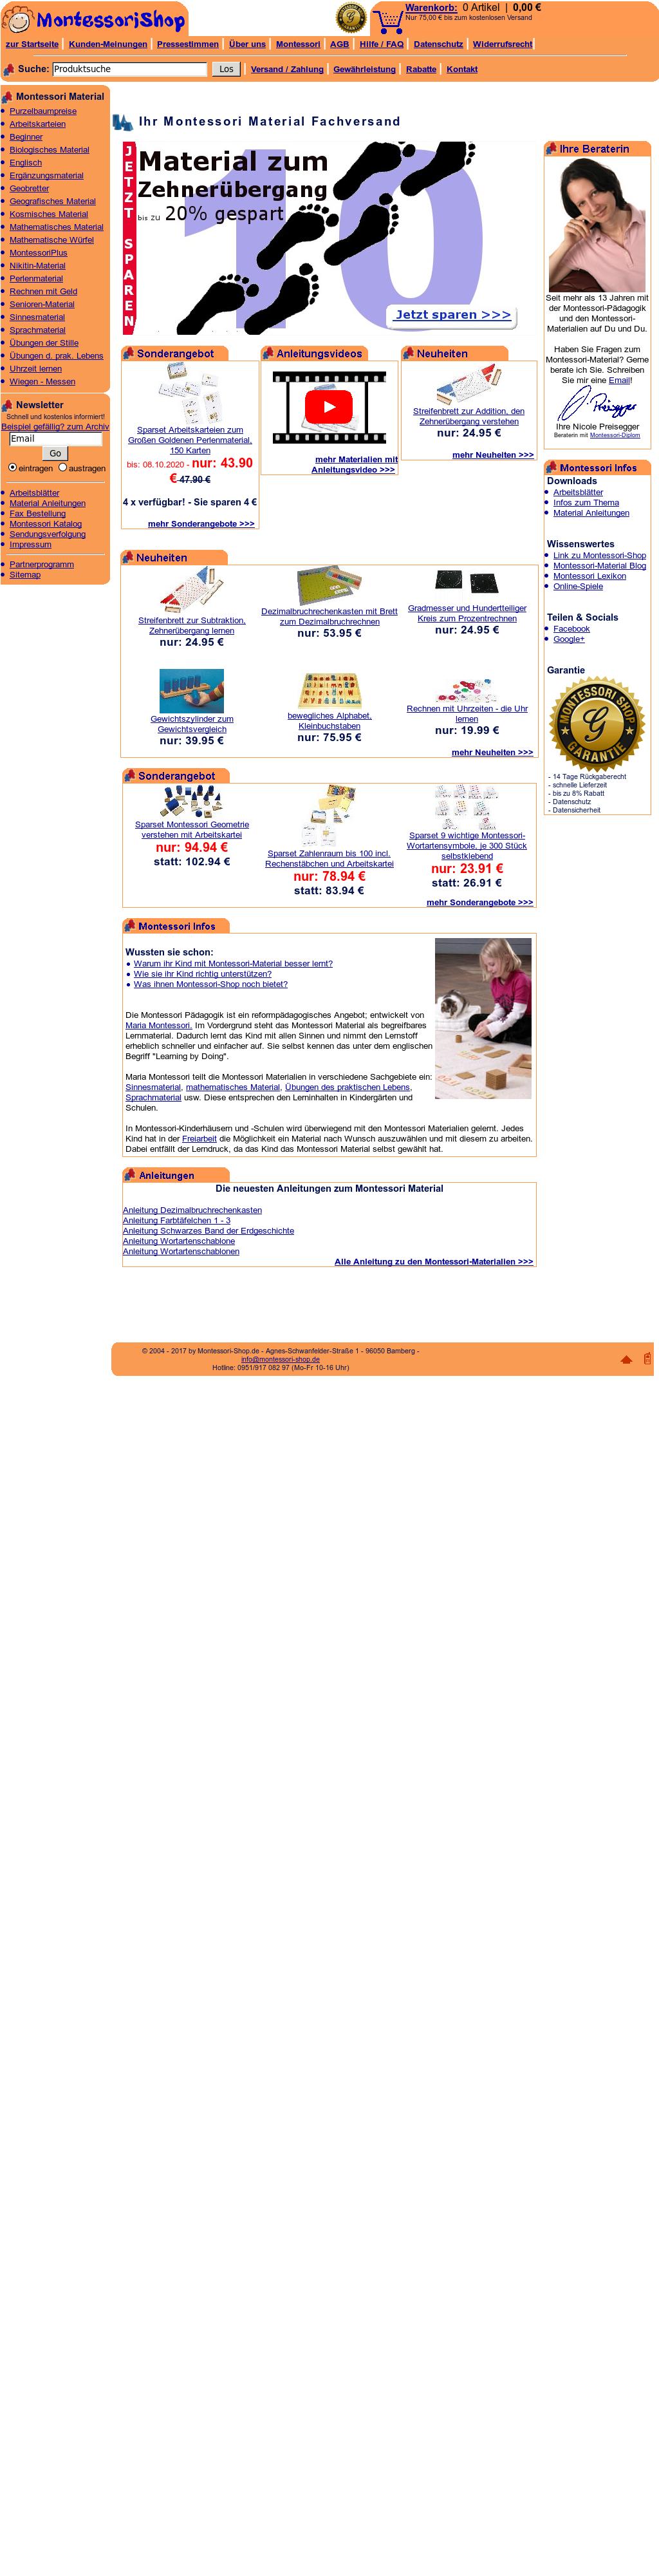 Montessorimaterialien Competitors, Revenue and Employees - Owler ...